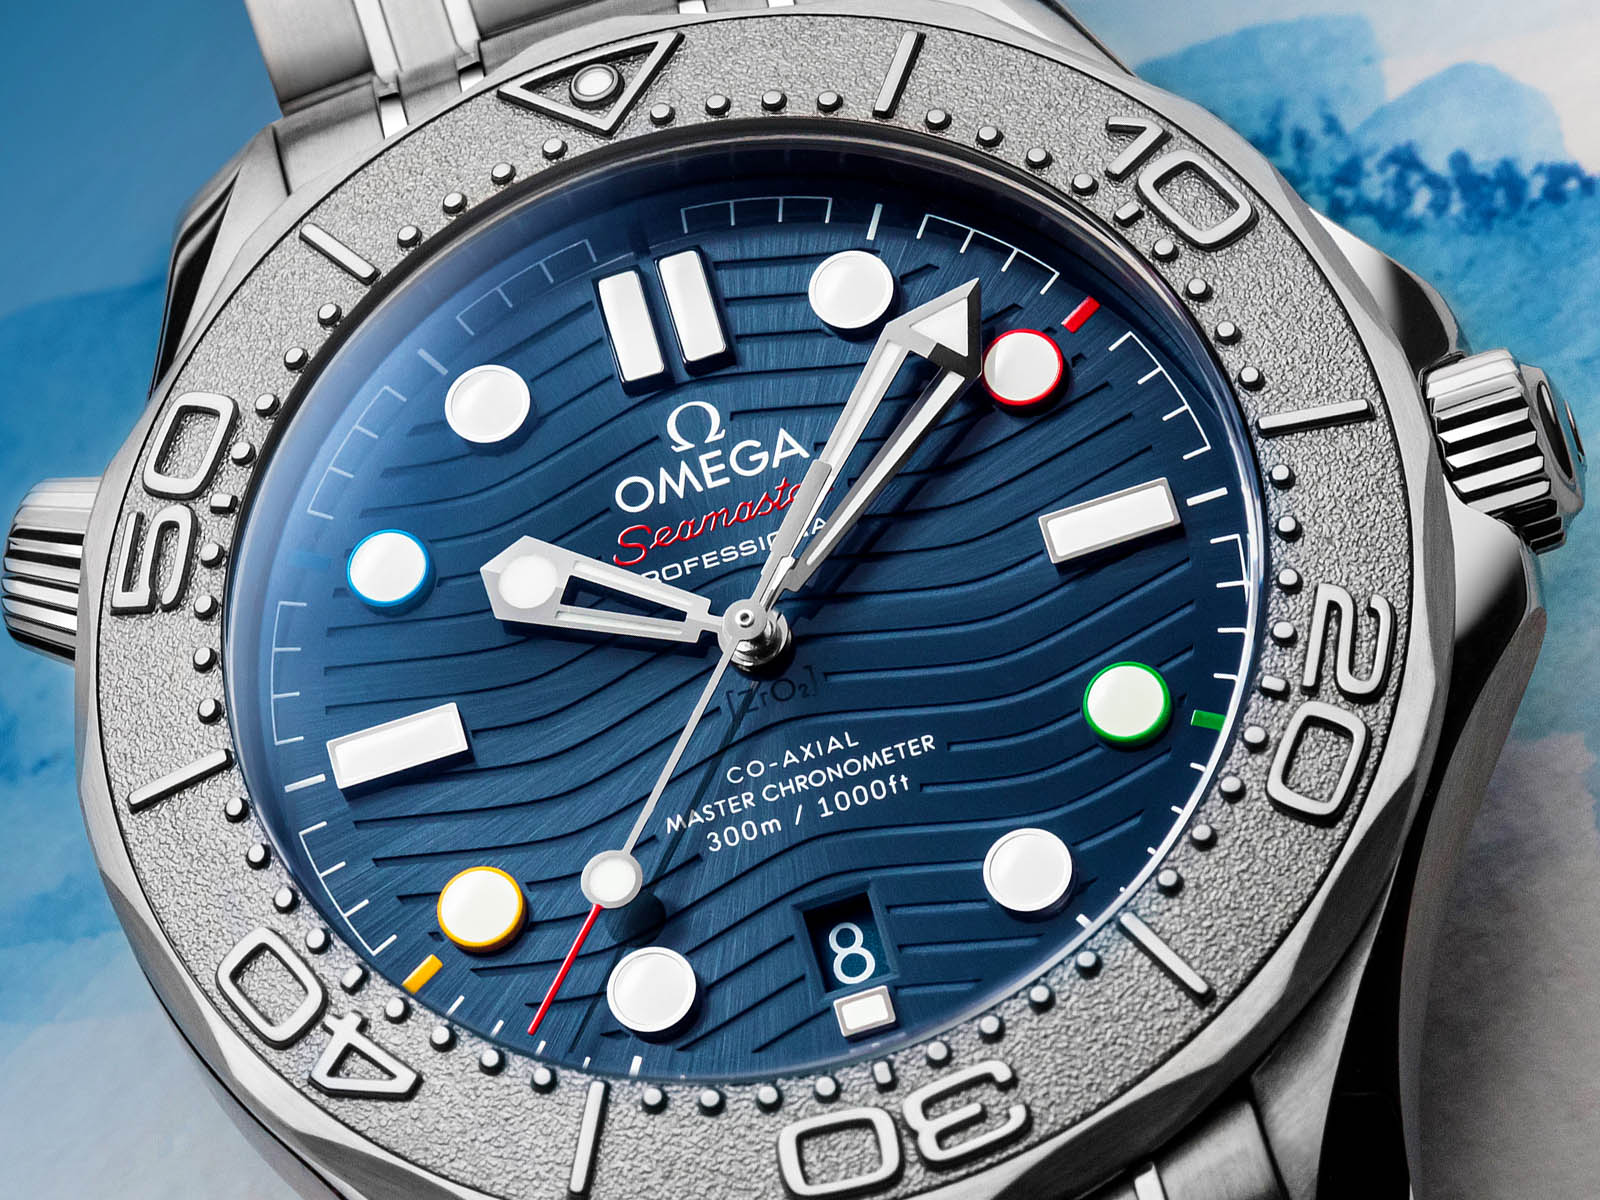 522-30-42-20-03-001-omega-seamaster-diver-300m-beijing-2022-special-edition-3.jpg